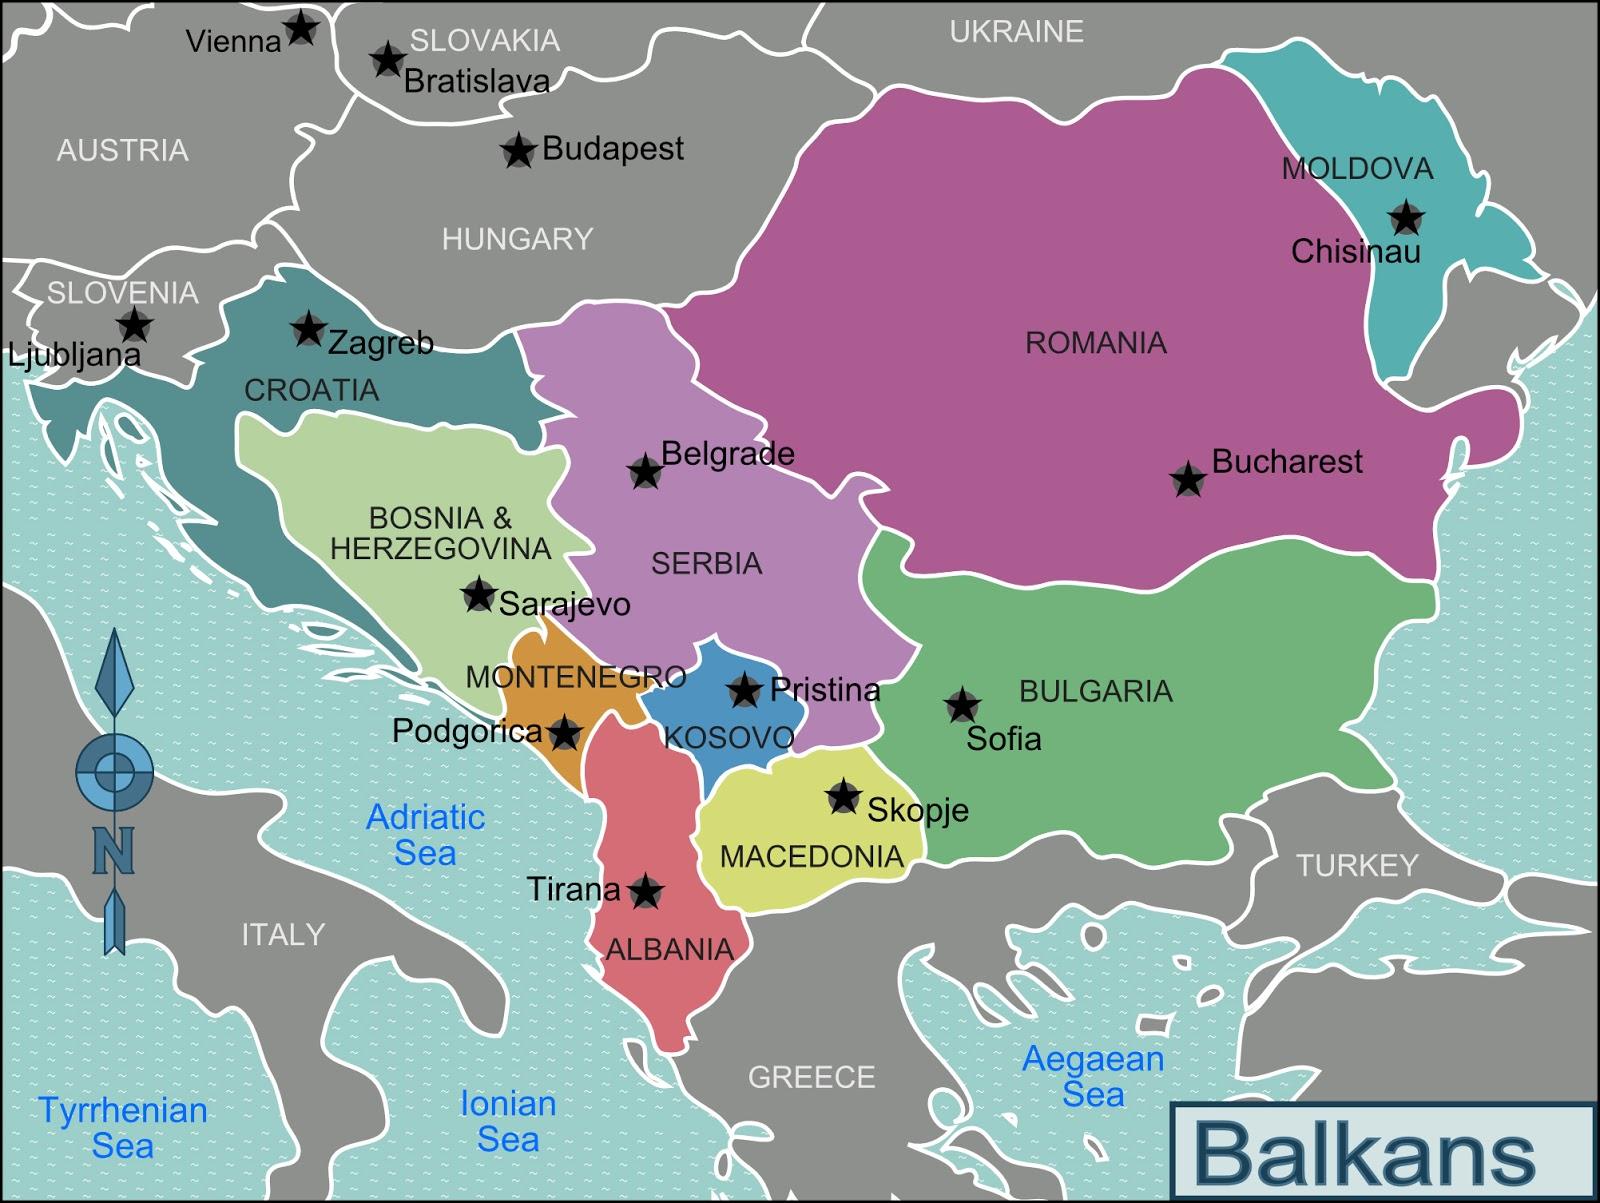 Map Of Us Allies And Enemies Globalinterco - Map of us allies and enemies 2017